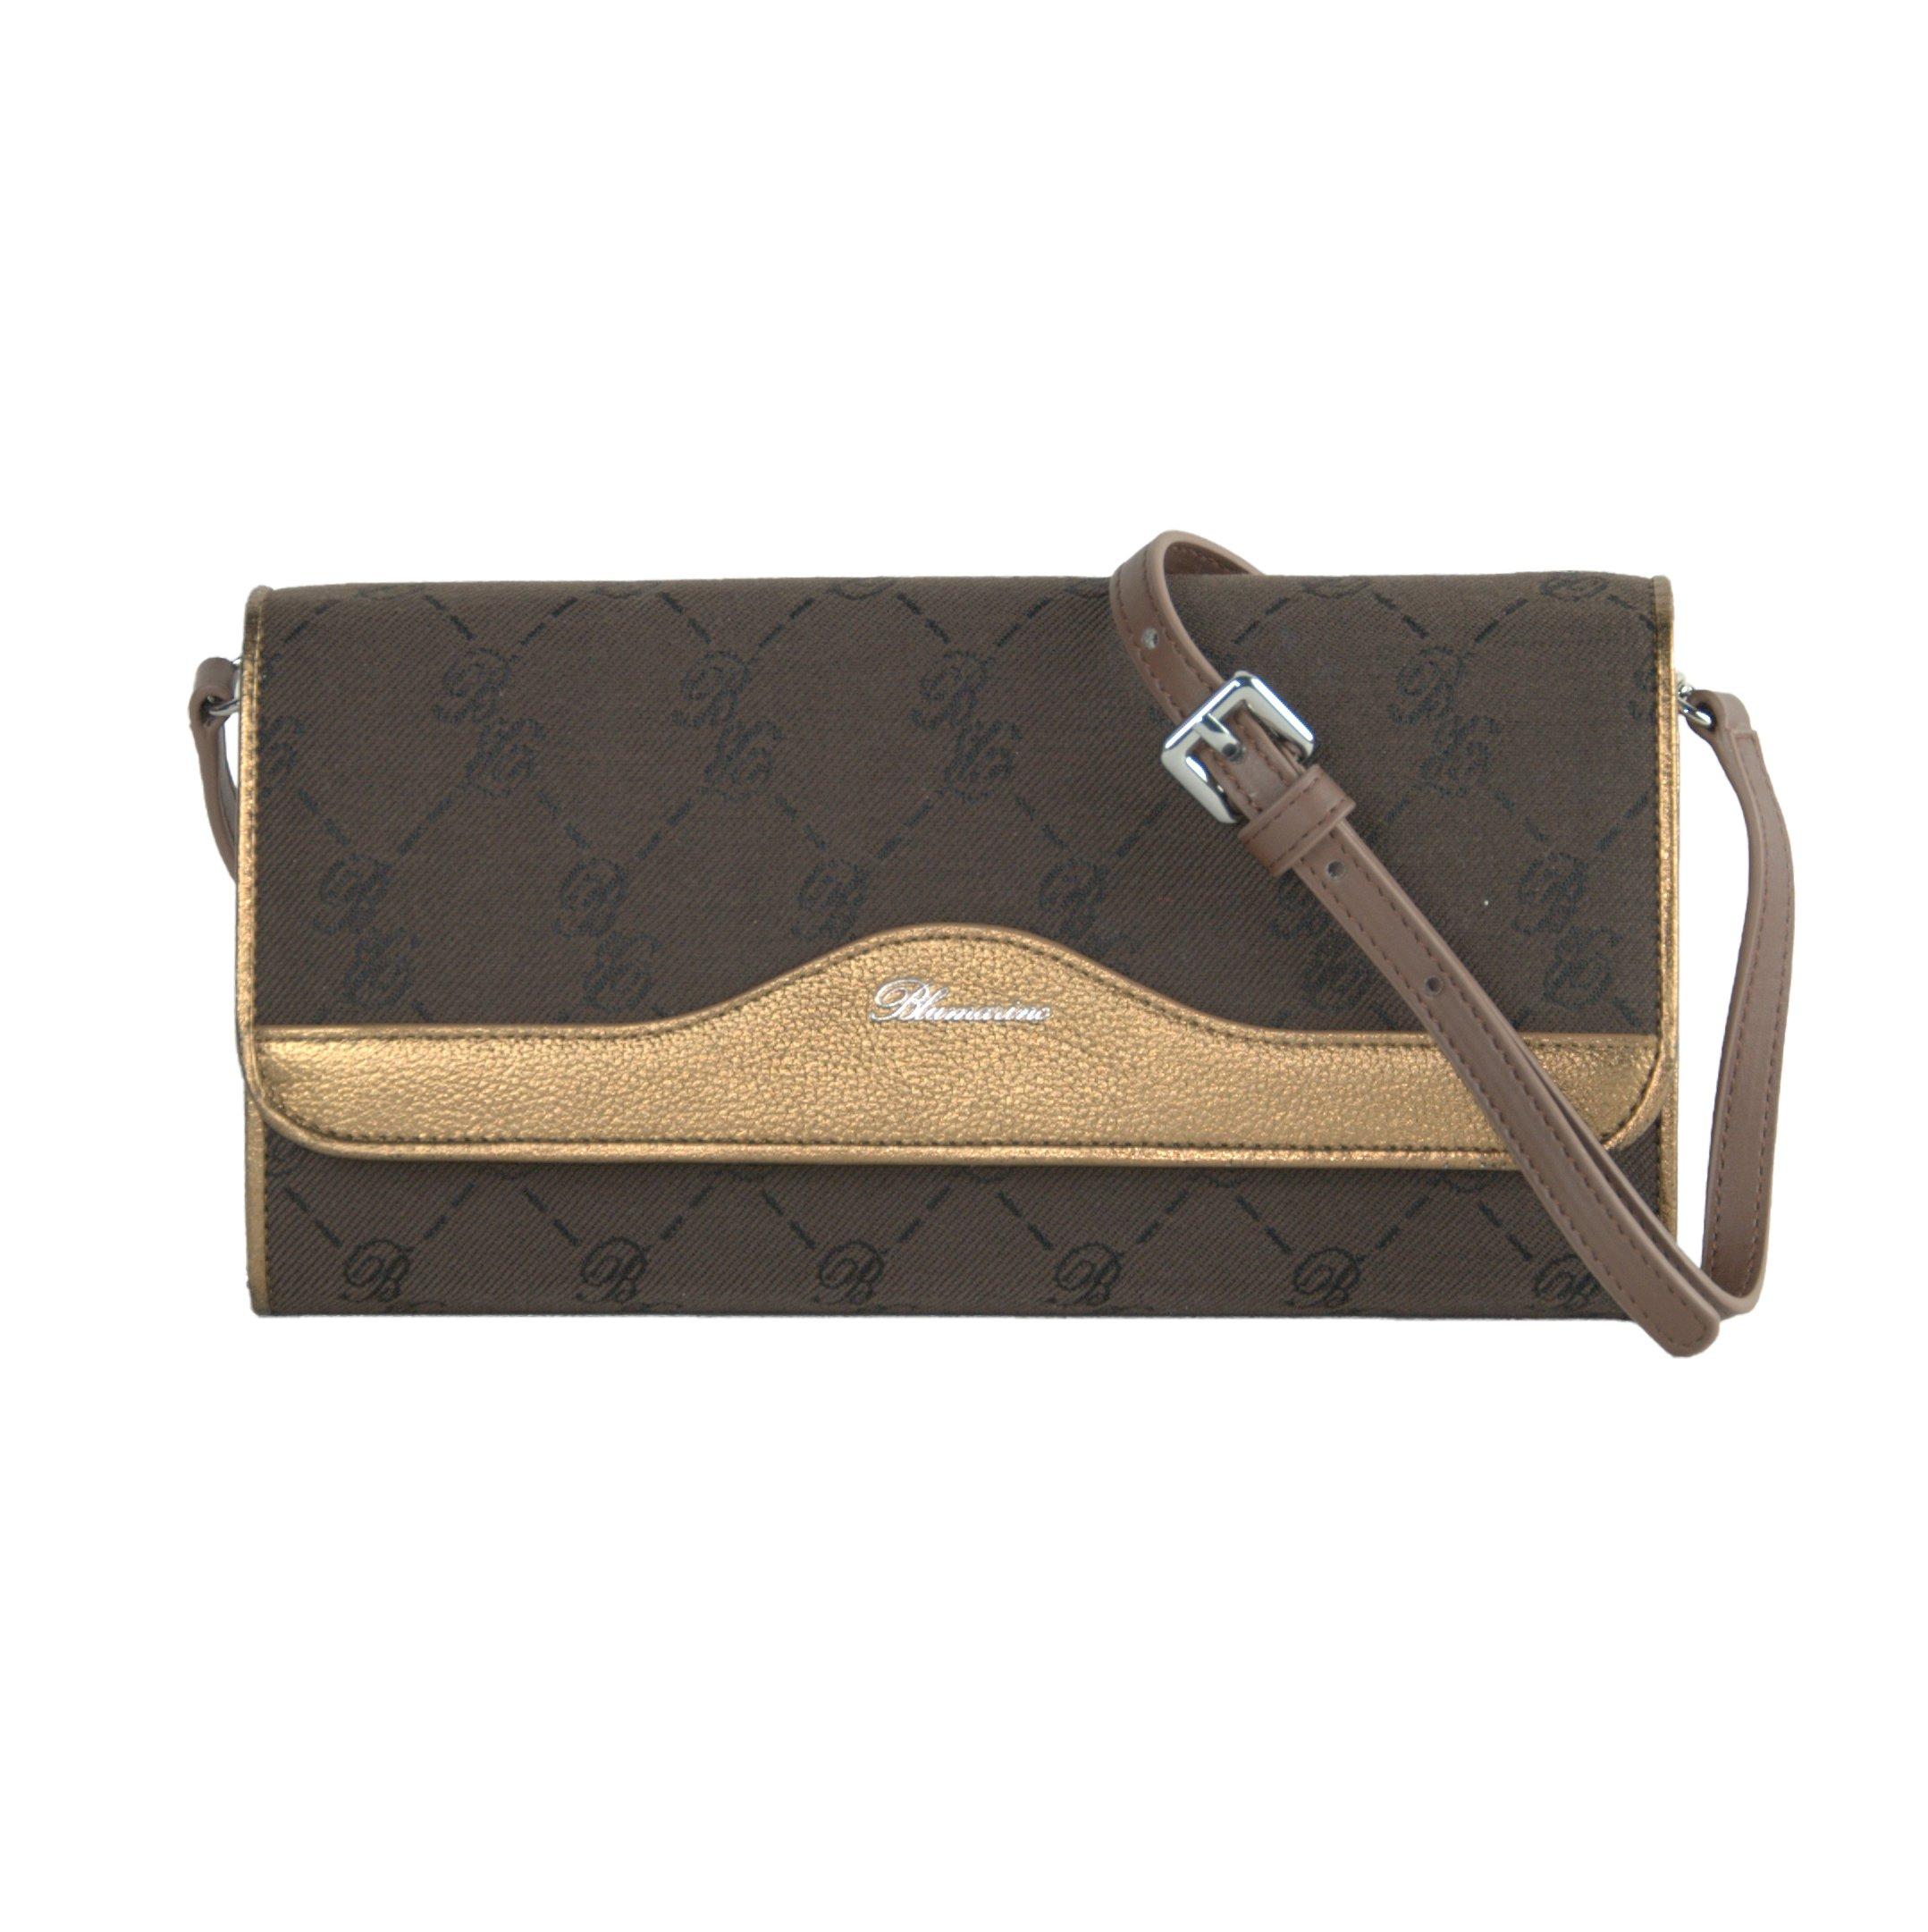 Blumarine Women's Clutch Bag Brown BL1421375